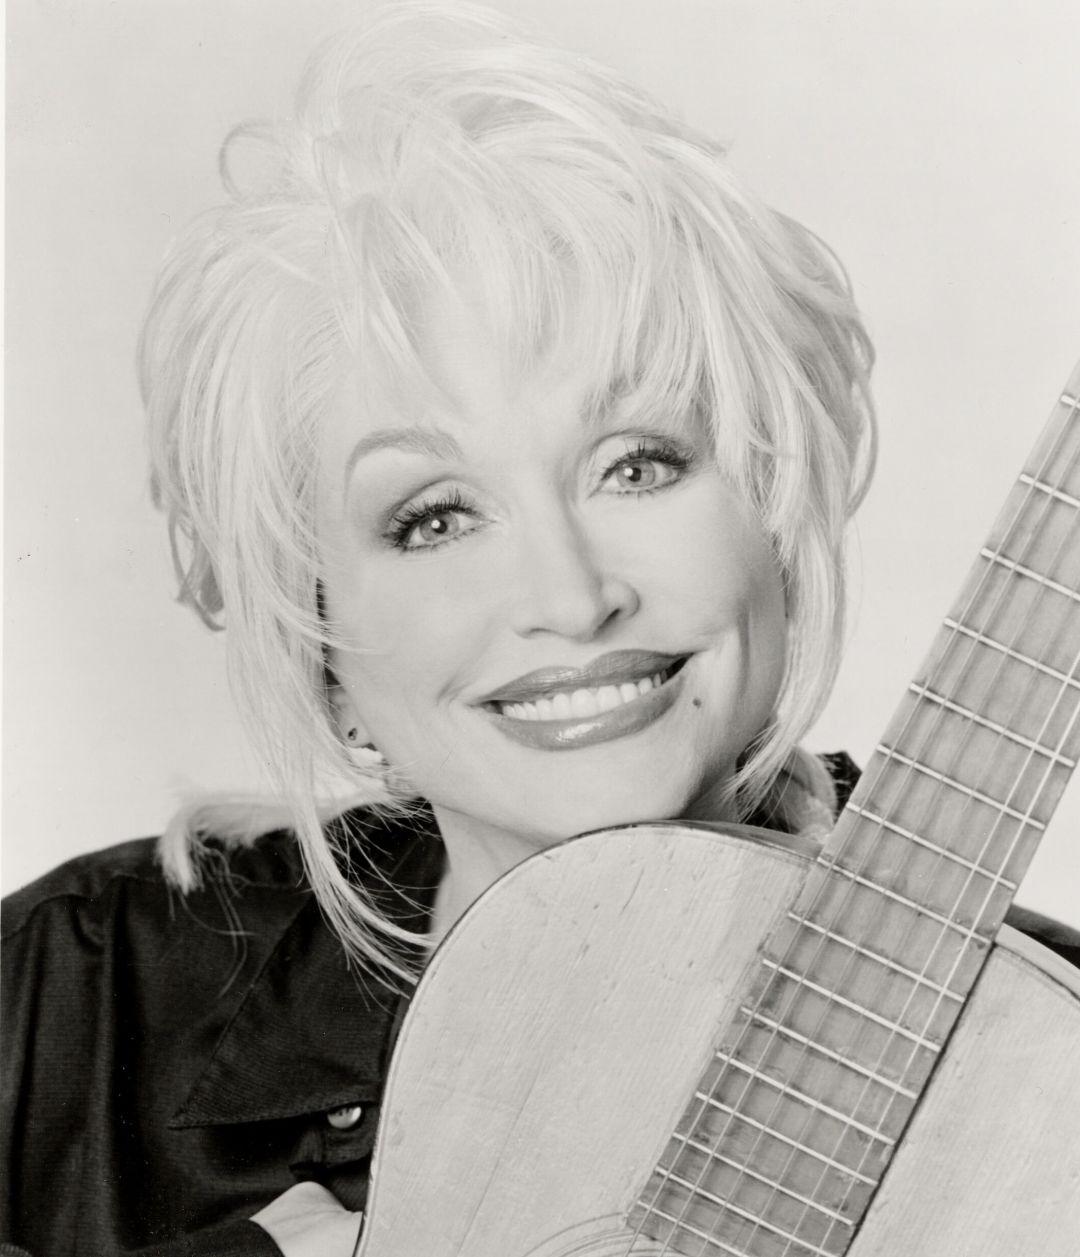 Dolly parton with guitar btd7ol